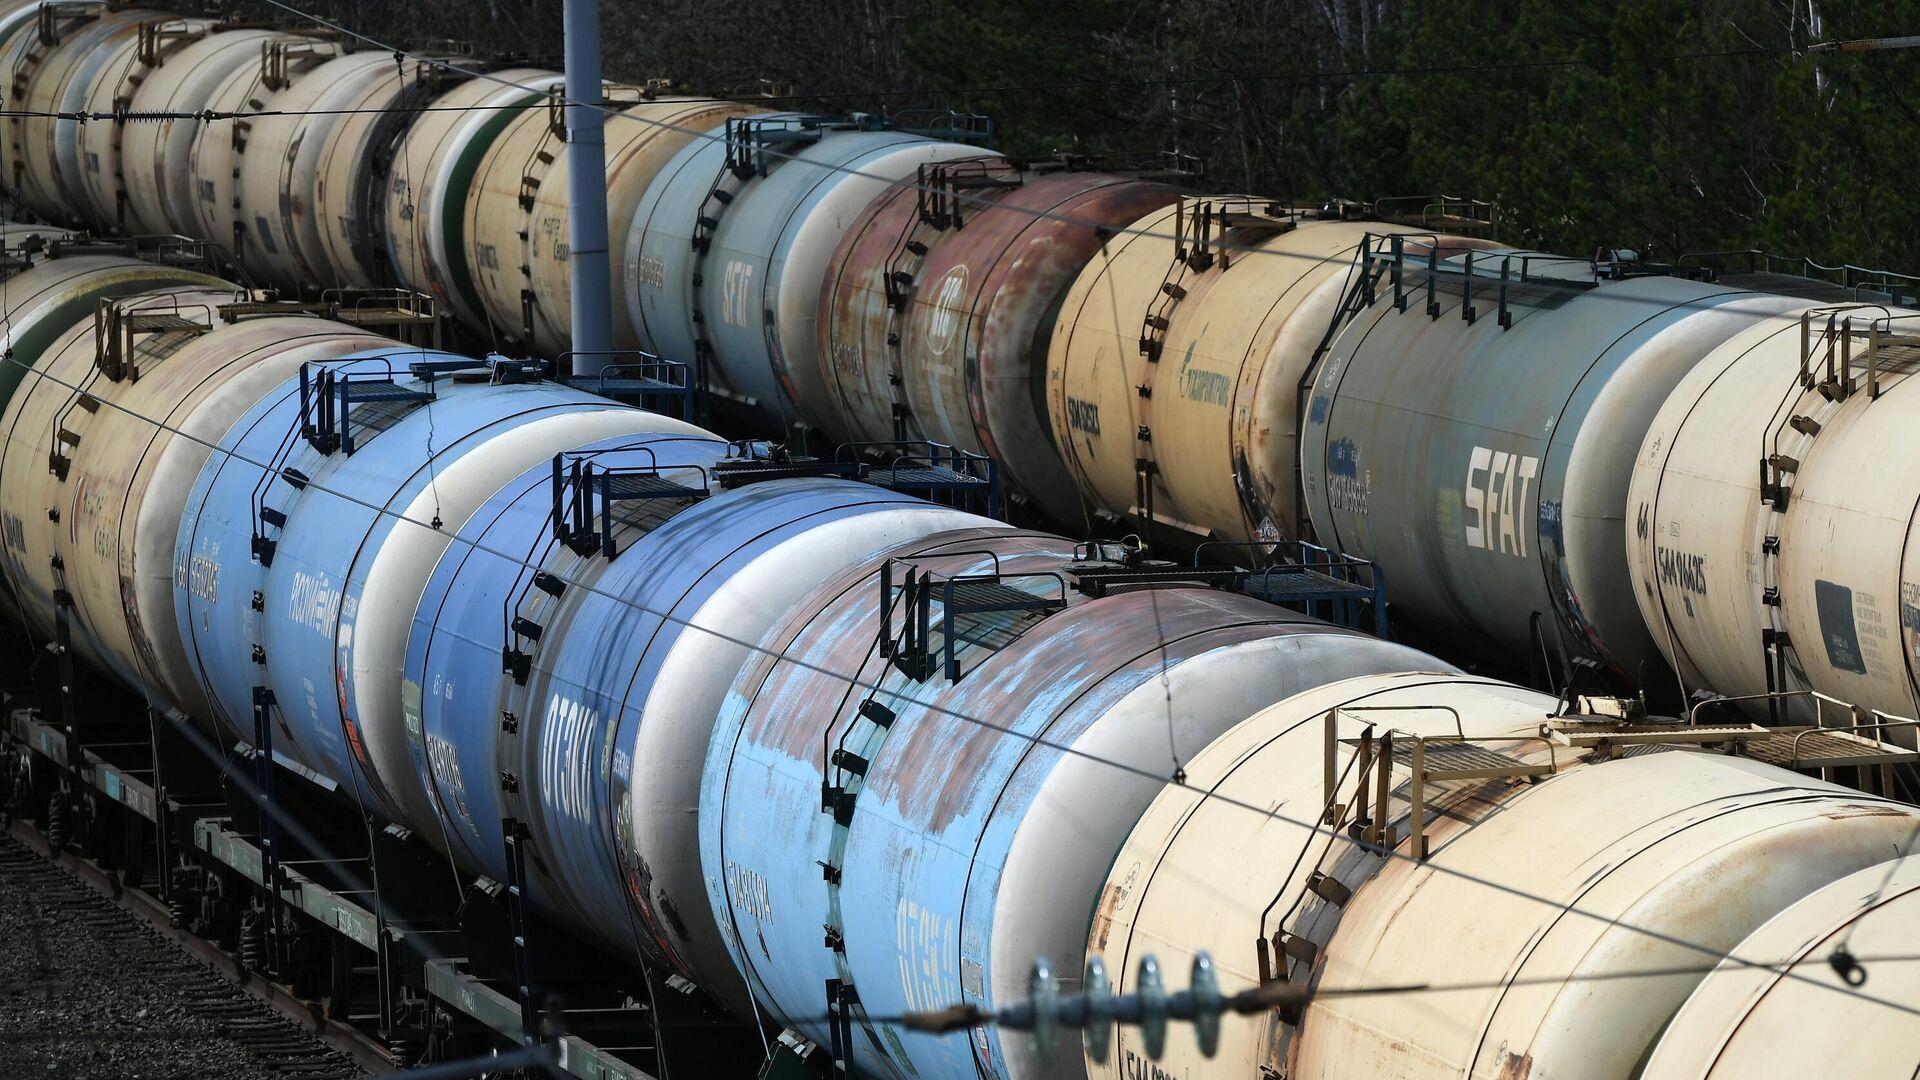 Власти прокомментировали разлив нефти в ЯНАО